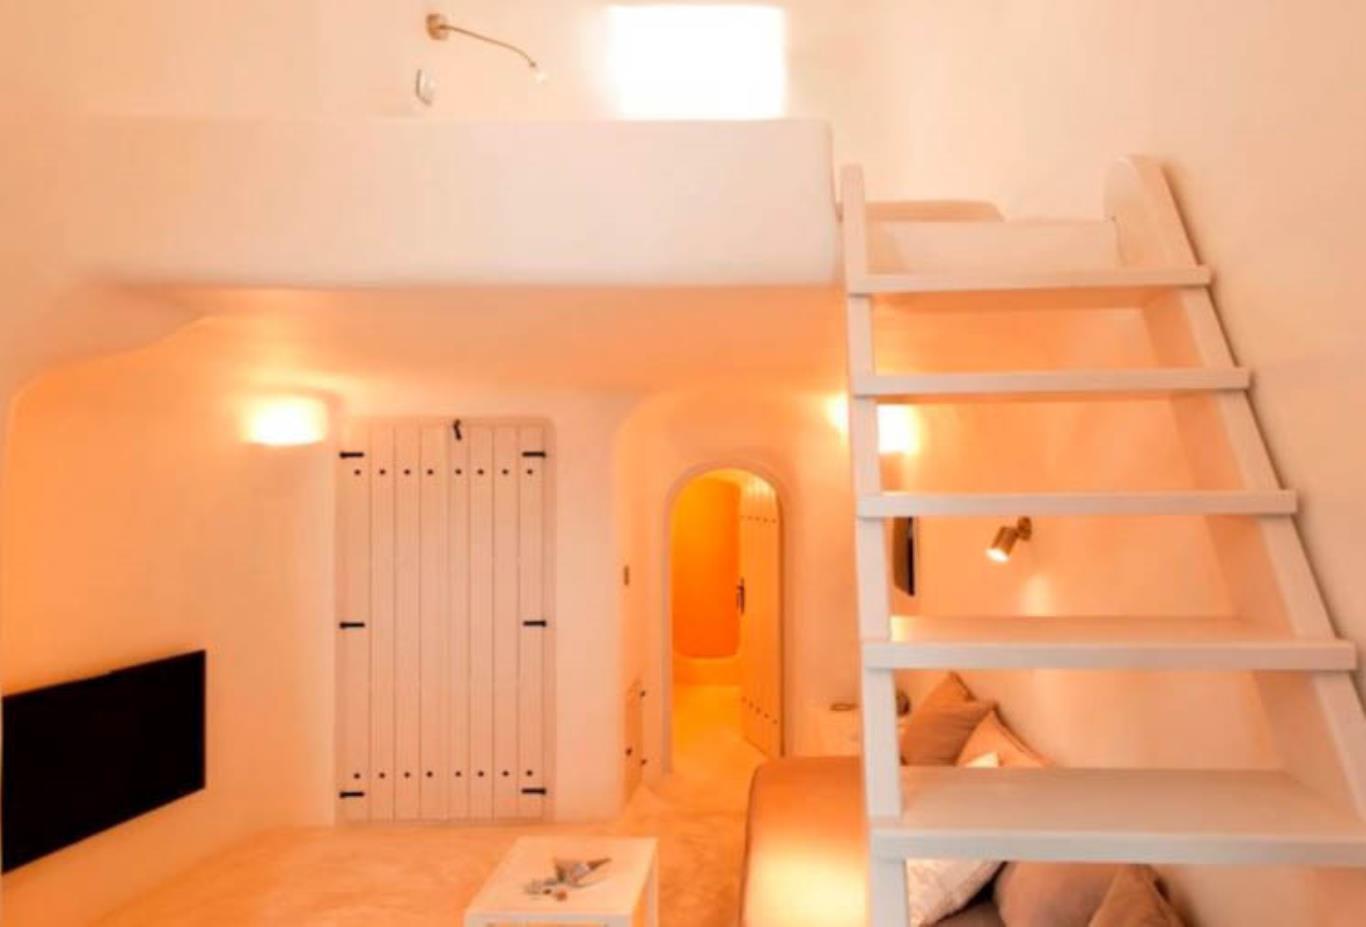 Vanilla Room Stairs